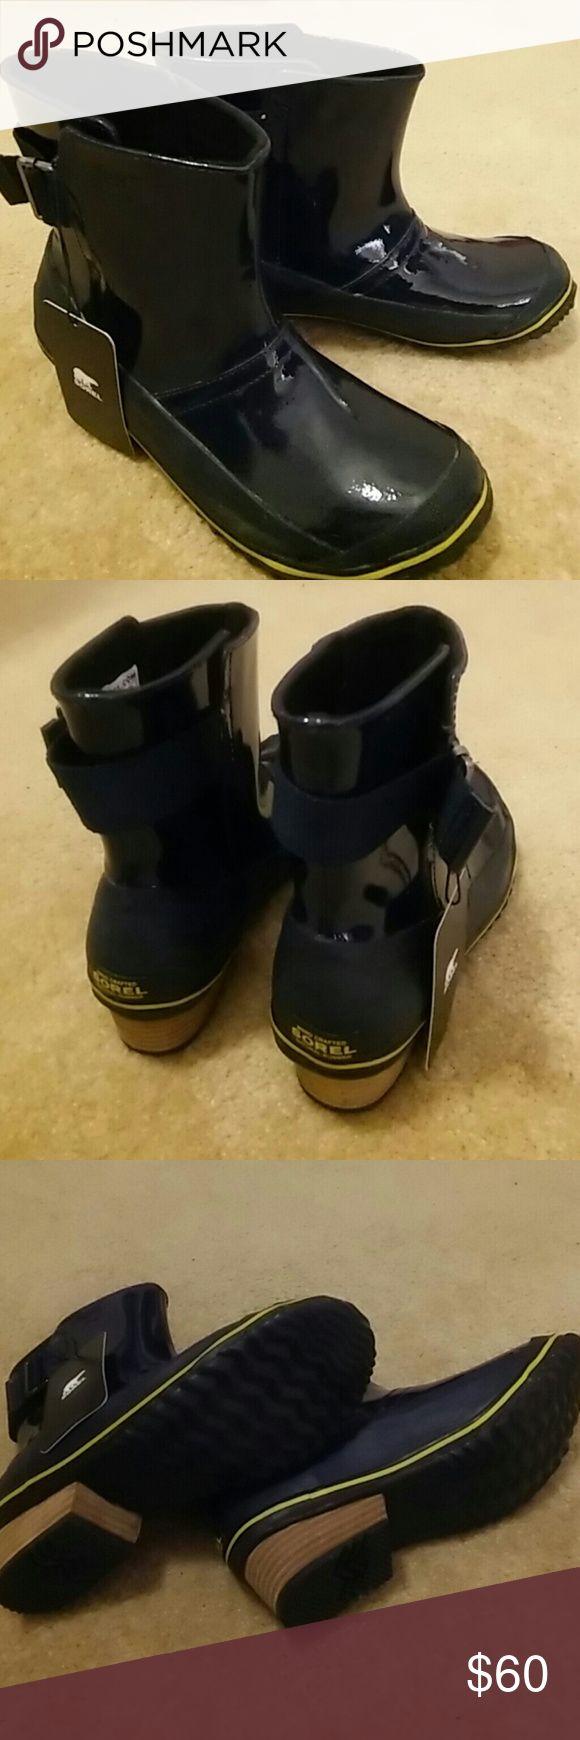 NWT Sorel Rain Boots Navy Navy Sorel rain boots. Brand new with tags. Size 7.5. Waterproof. Sorel Shoes Winter & Rain Boots